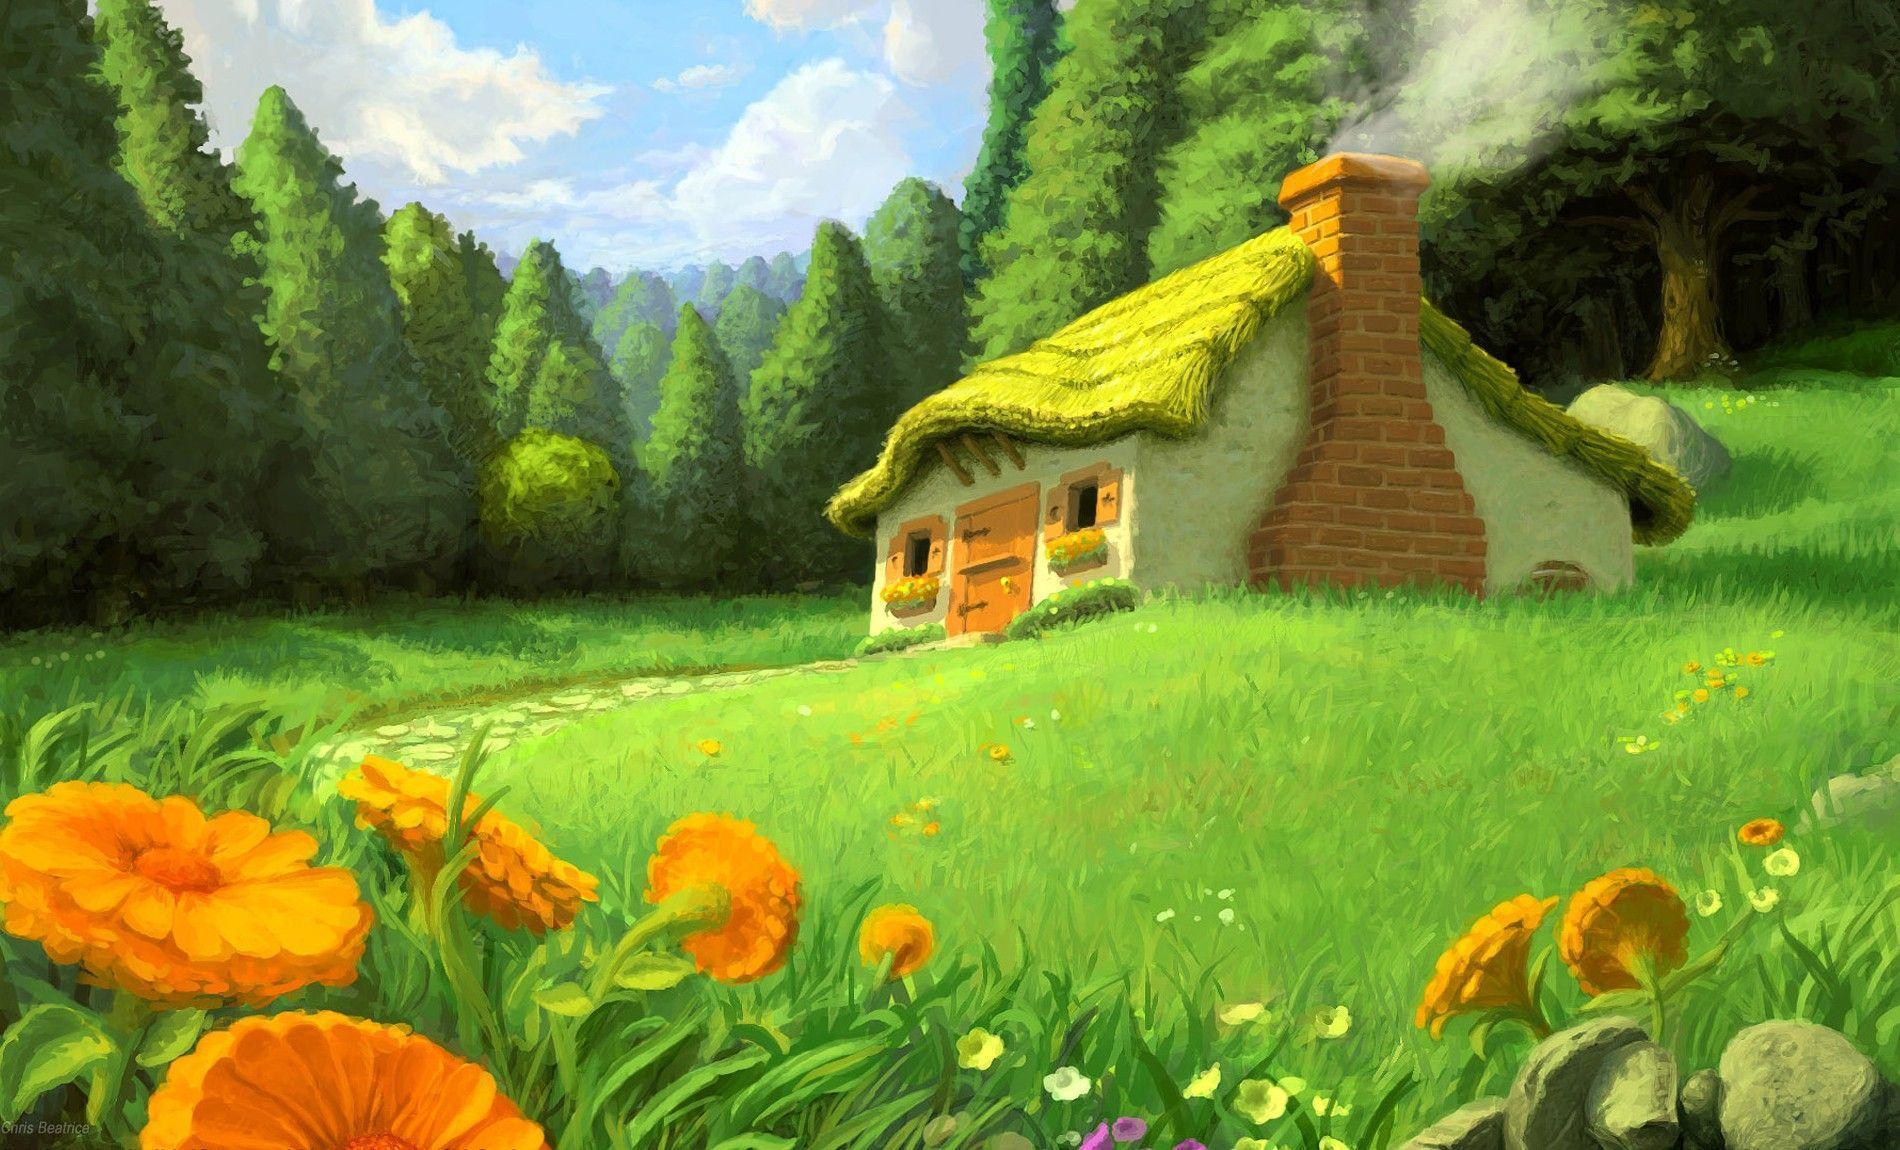 Nature Wallpaper ›› Hd Fantasy Nature Wallpapers | Funonsite